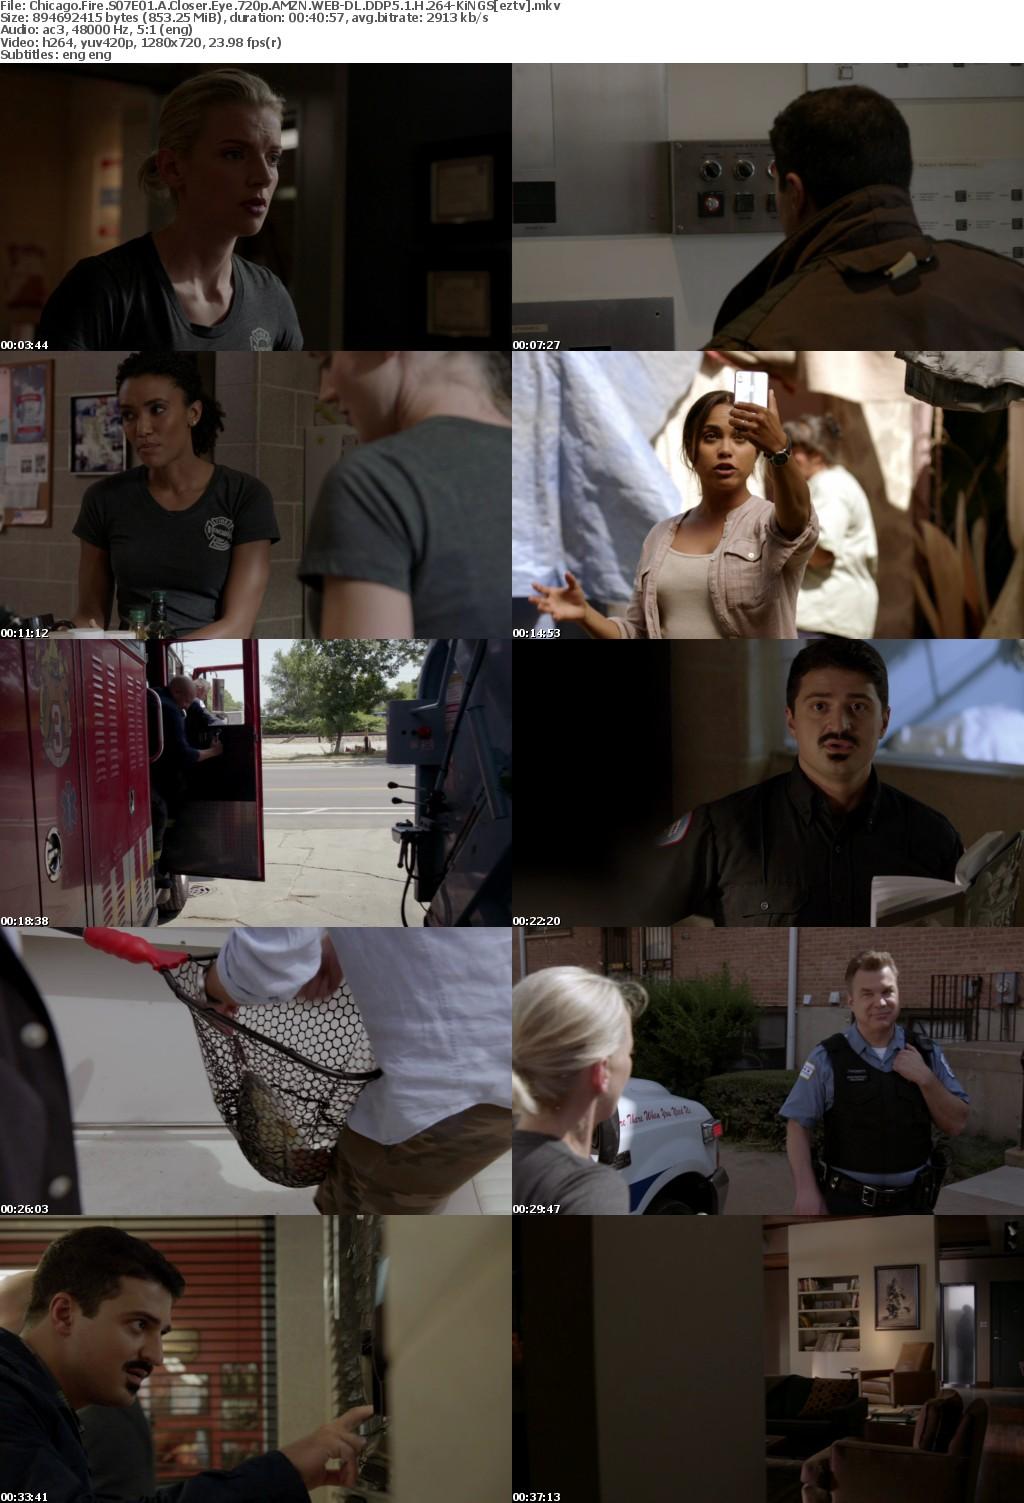 Chicago Fire S07E01 A Closer Eye 720p AMZN WEB-DL DDP5 1 H 264-KiNGS